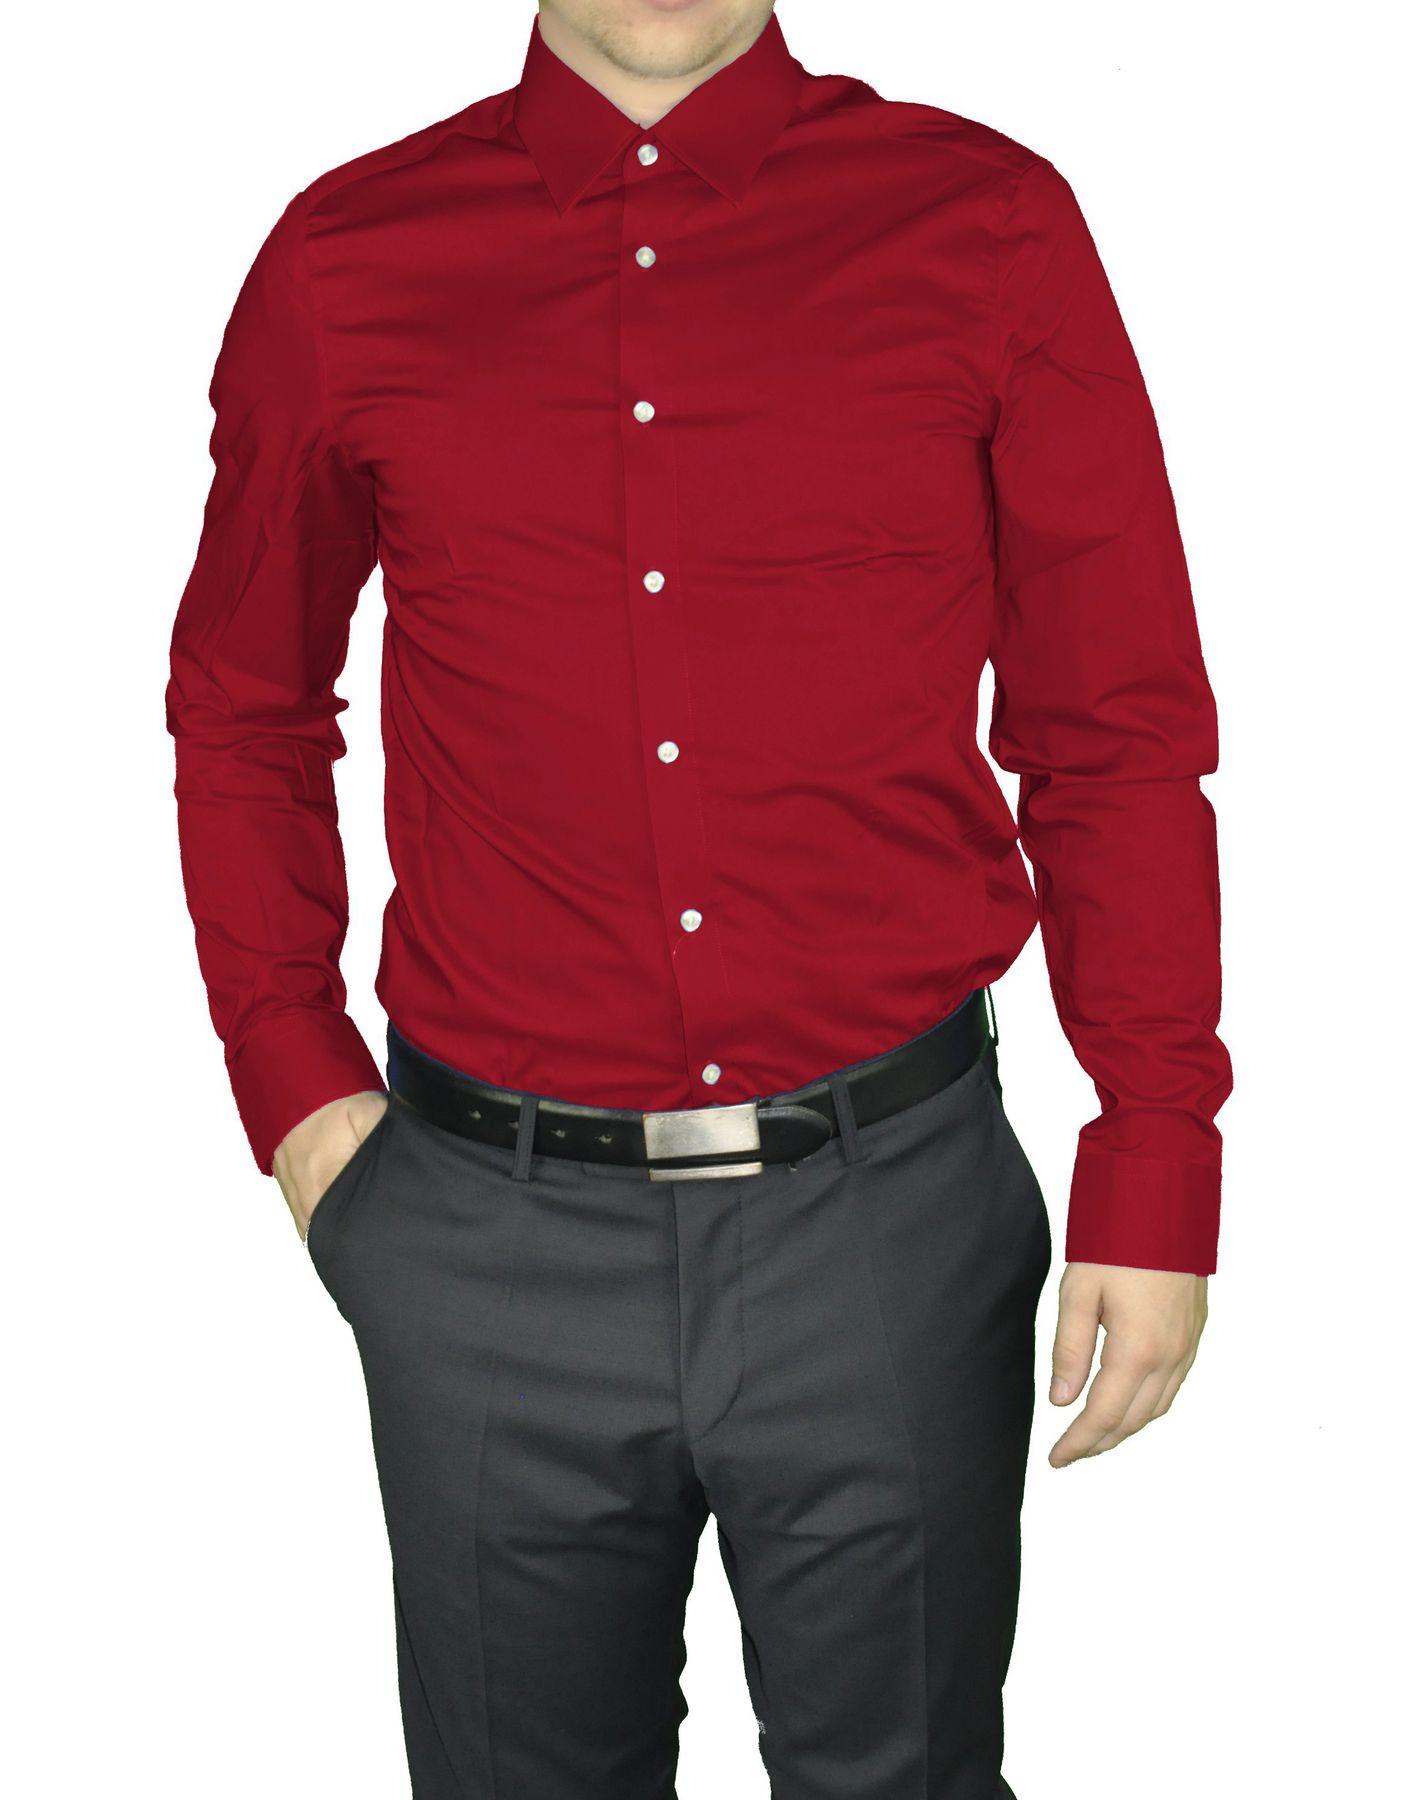 Redmond - Herren Slim Fit Hemd in verschiedenen Farben (400130/17A) – Bild 6